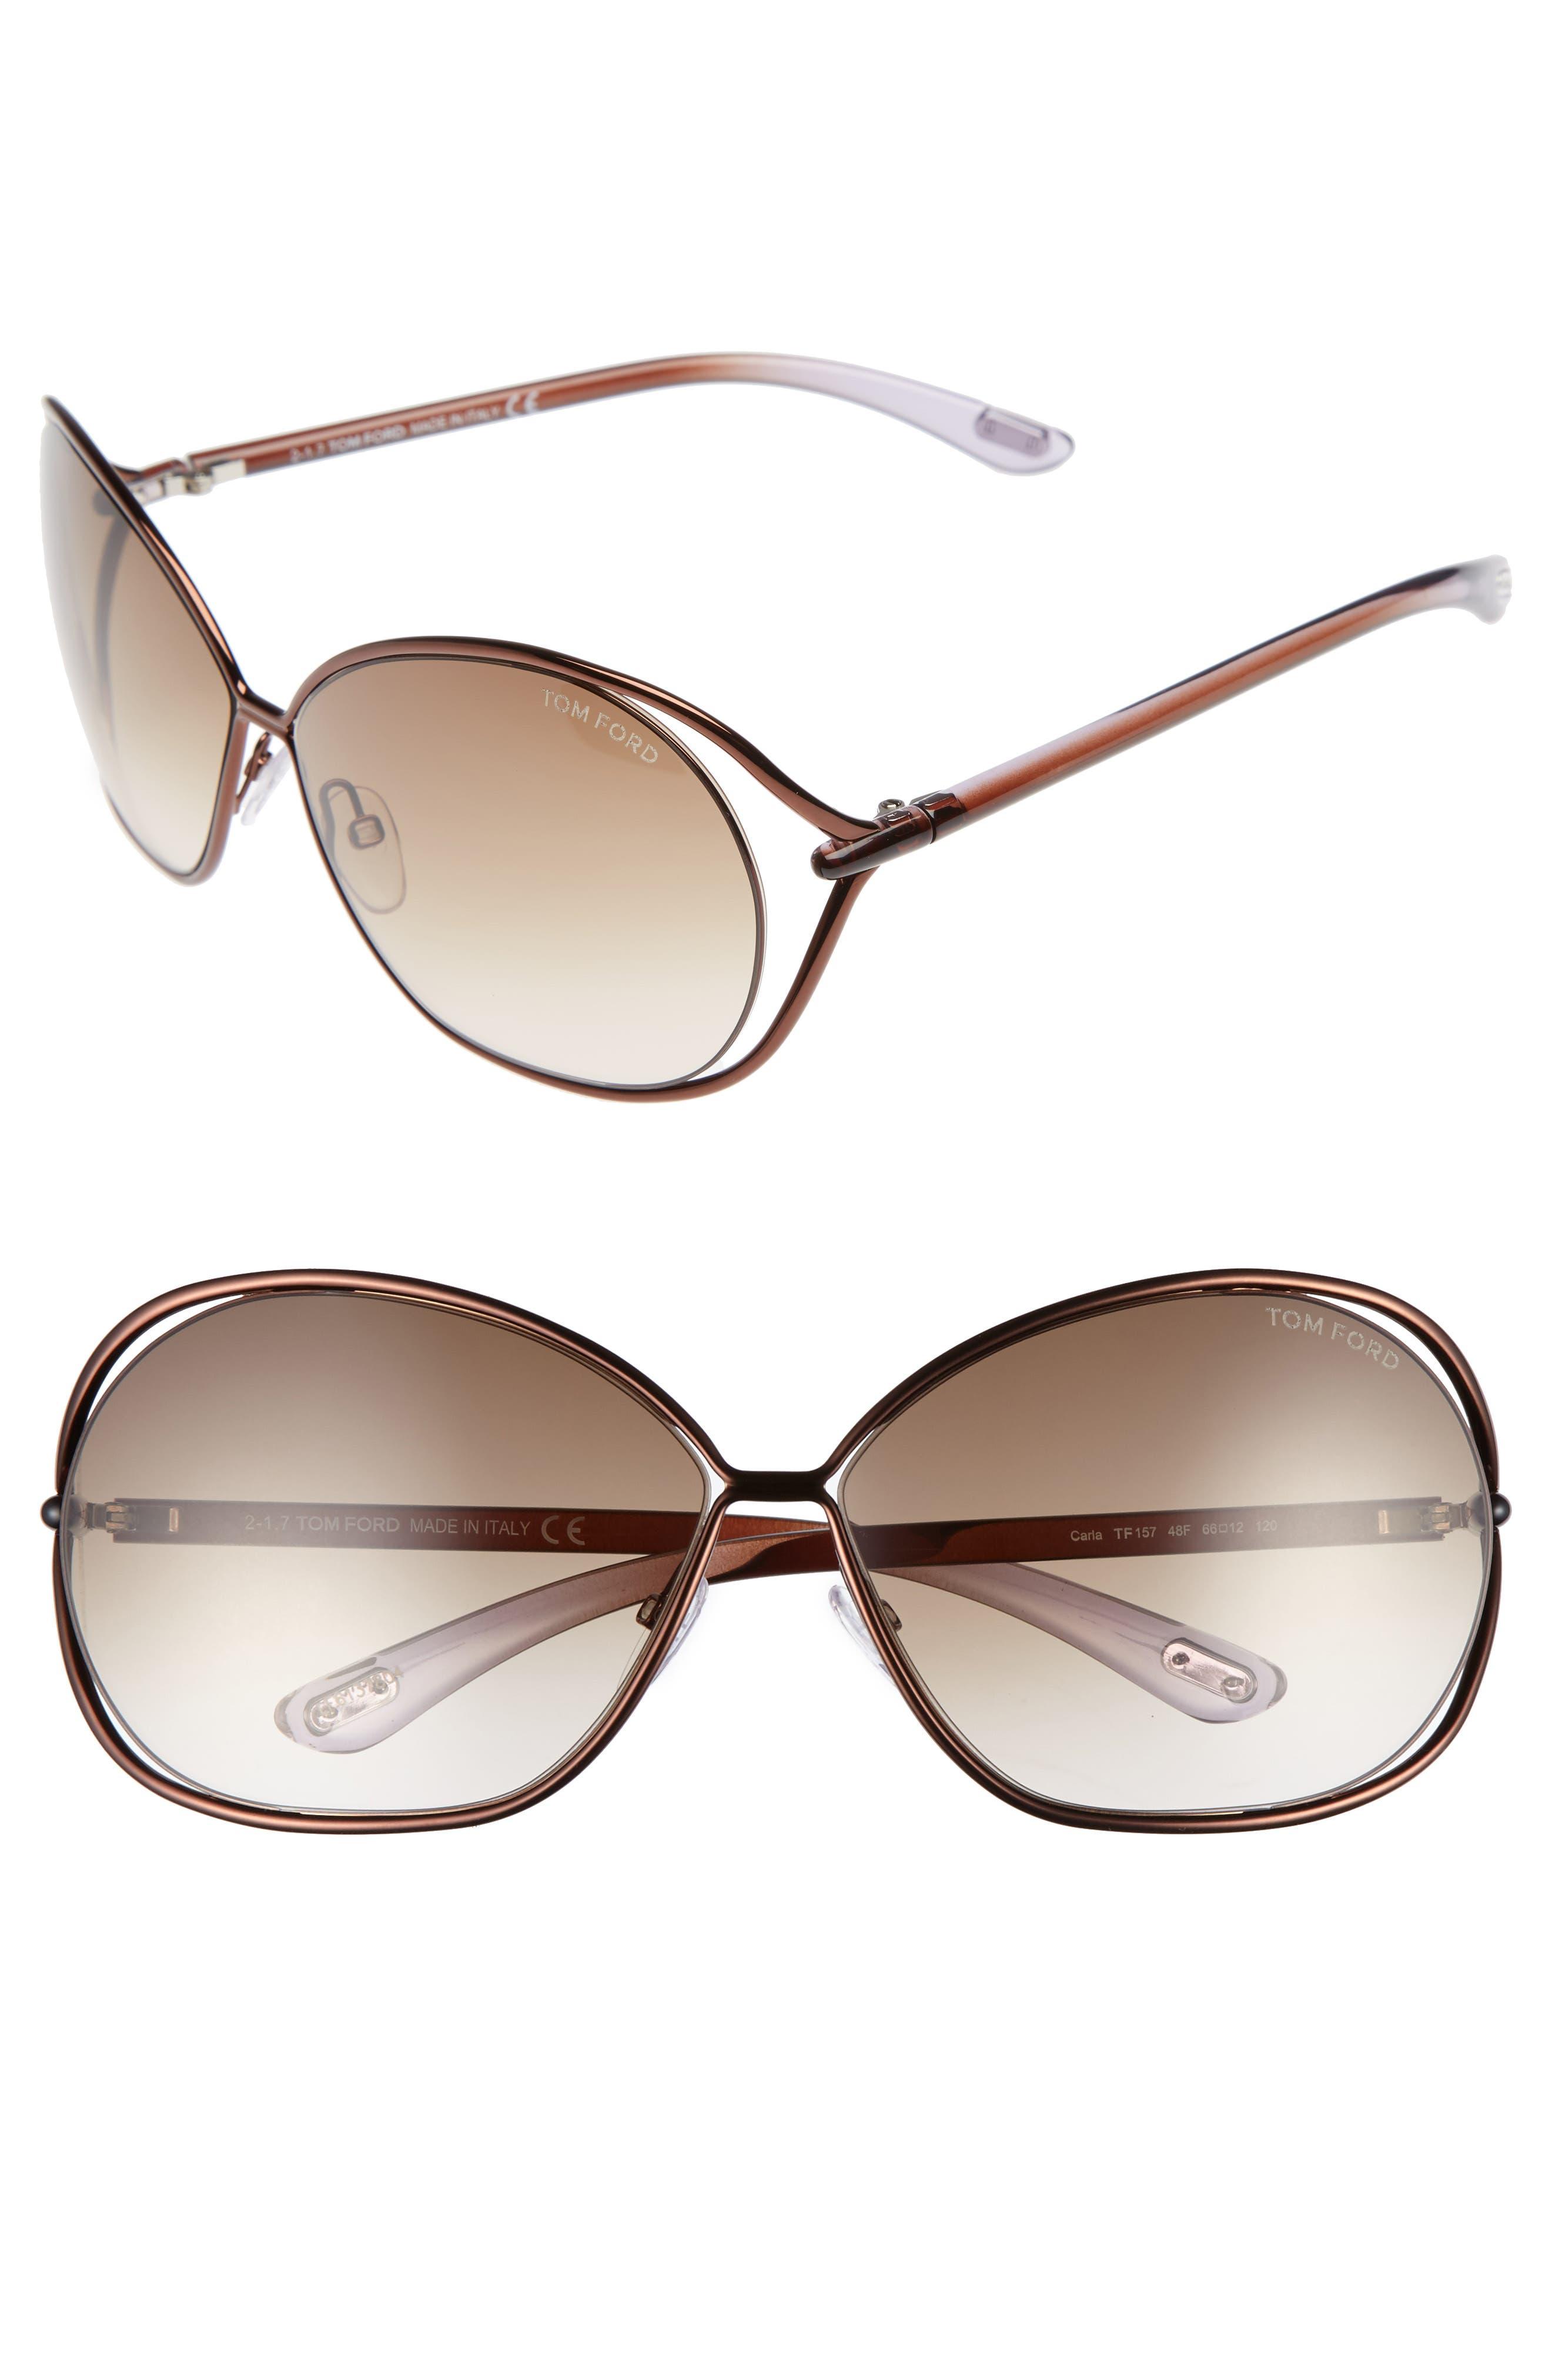 Main Image - Tom Ford Carla 66mm Oversized Round Metal Sunglasses